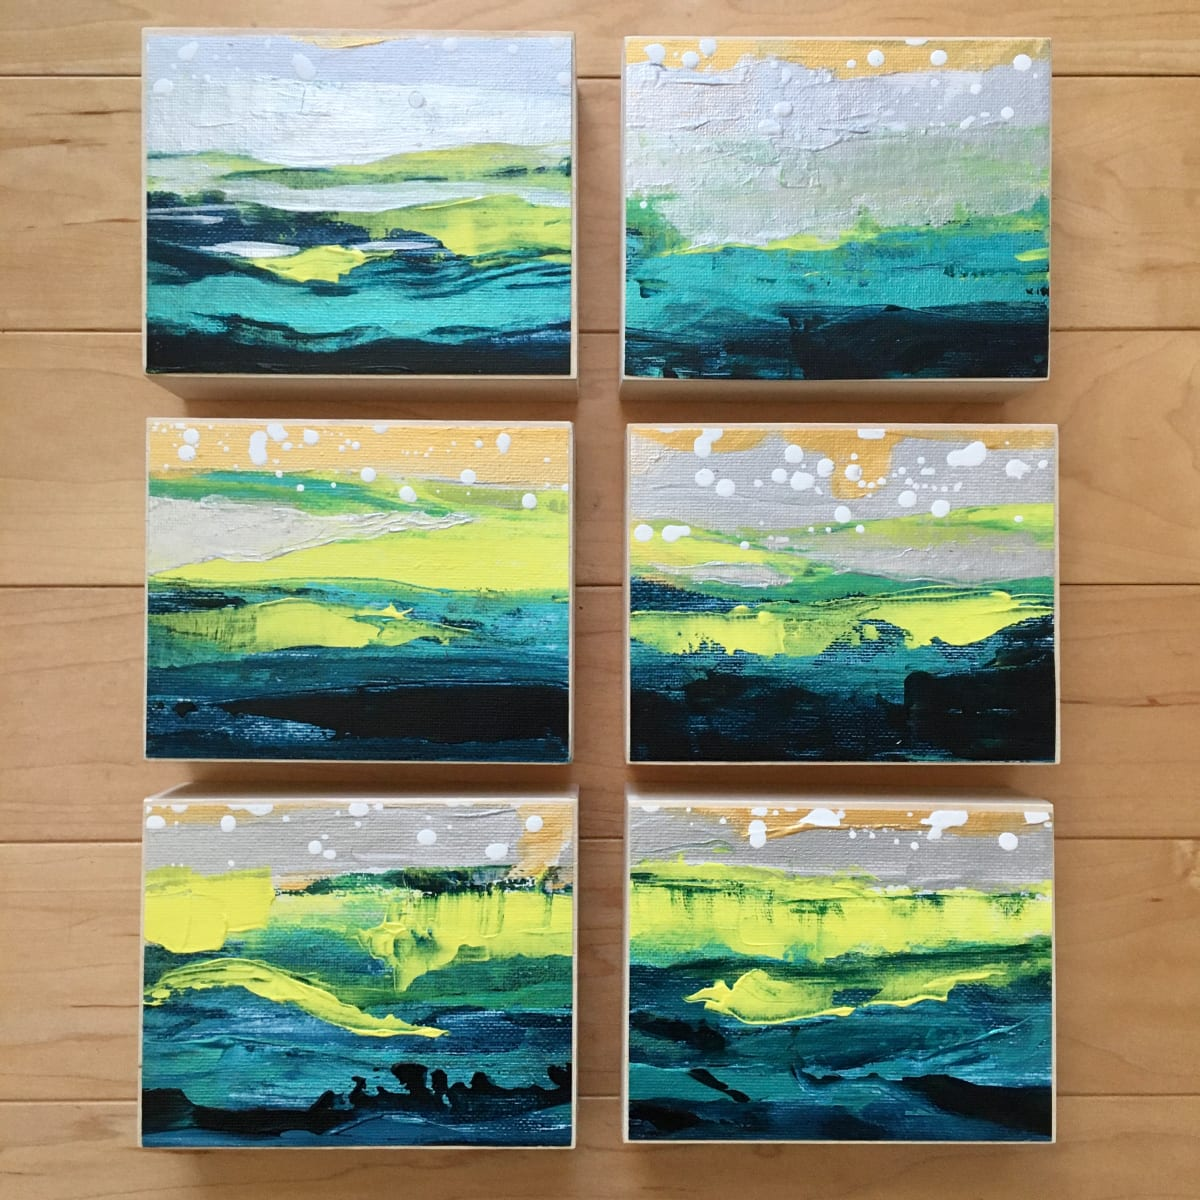 'Sun on the Ocean' Mini Paintings 1-2-3-4-5-6 by Julea Boswell